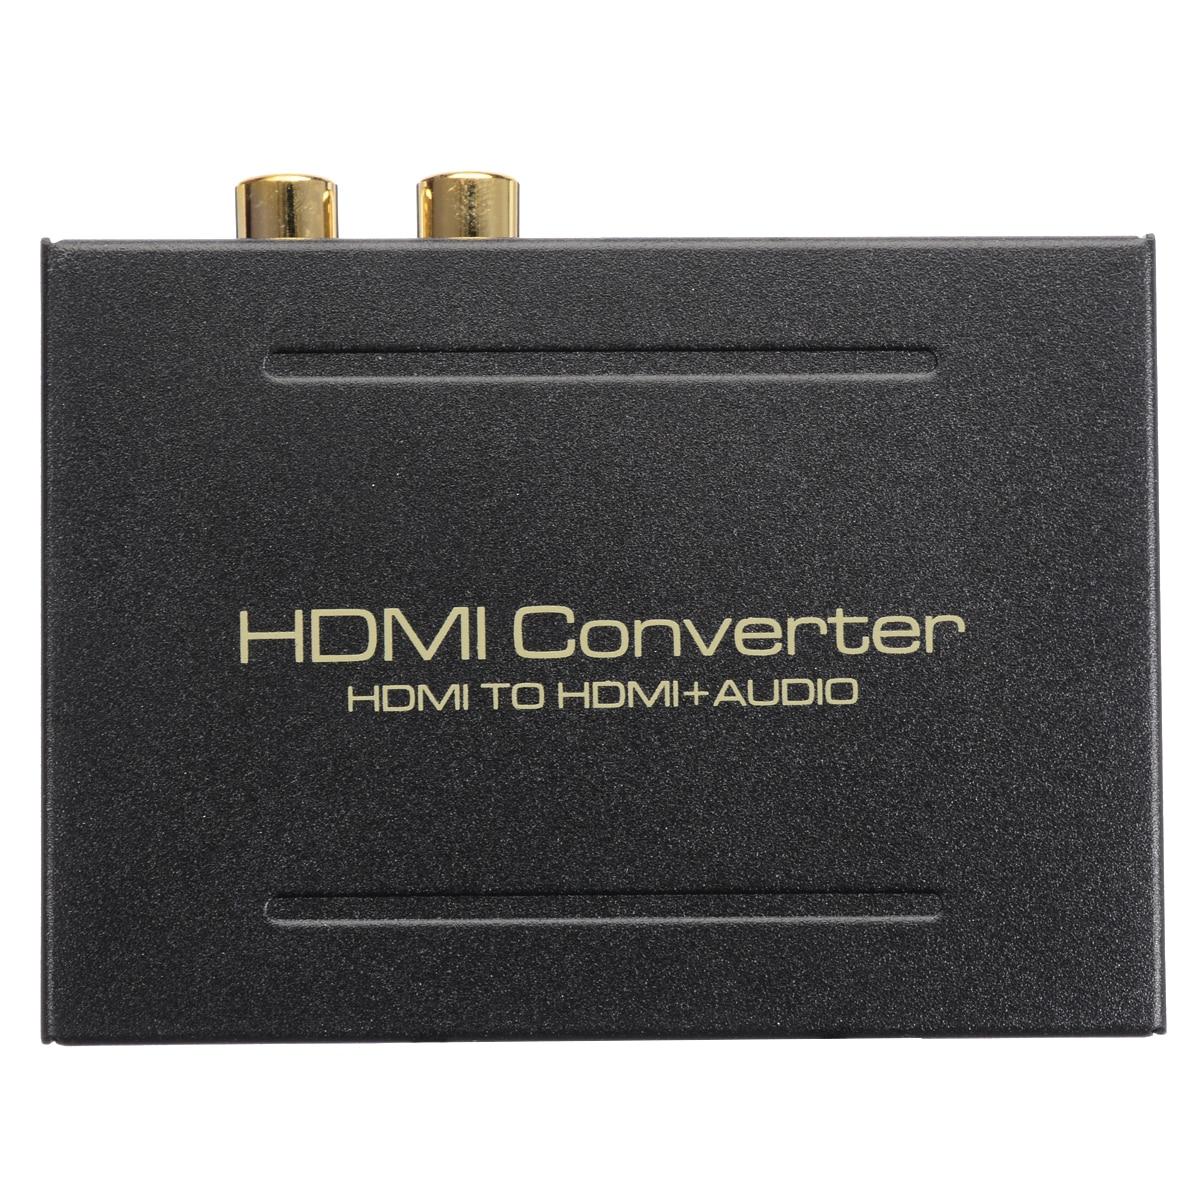 HDMI аудио экстрактор конвертер 5.1CH аудио сплиттер 1080P Стерео аналоговый HDMI к HDMI Оптический SPDIF RCA L/R адаптеры-Конвертеры